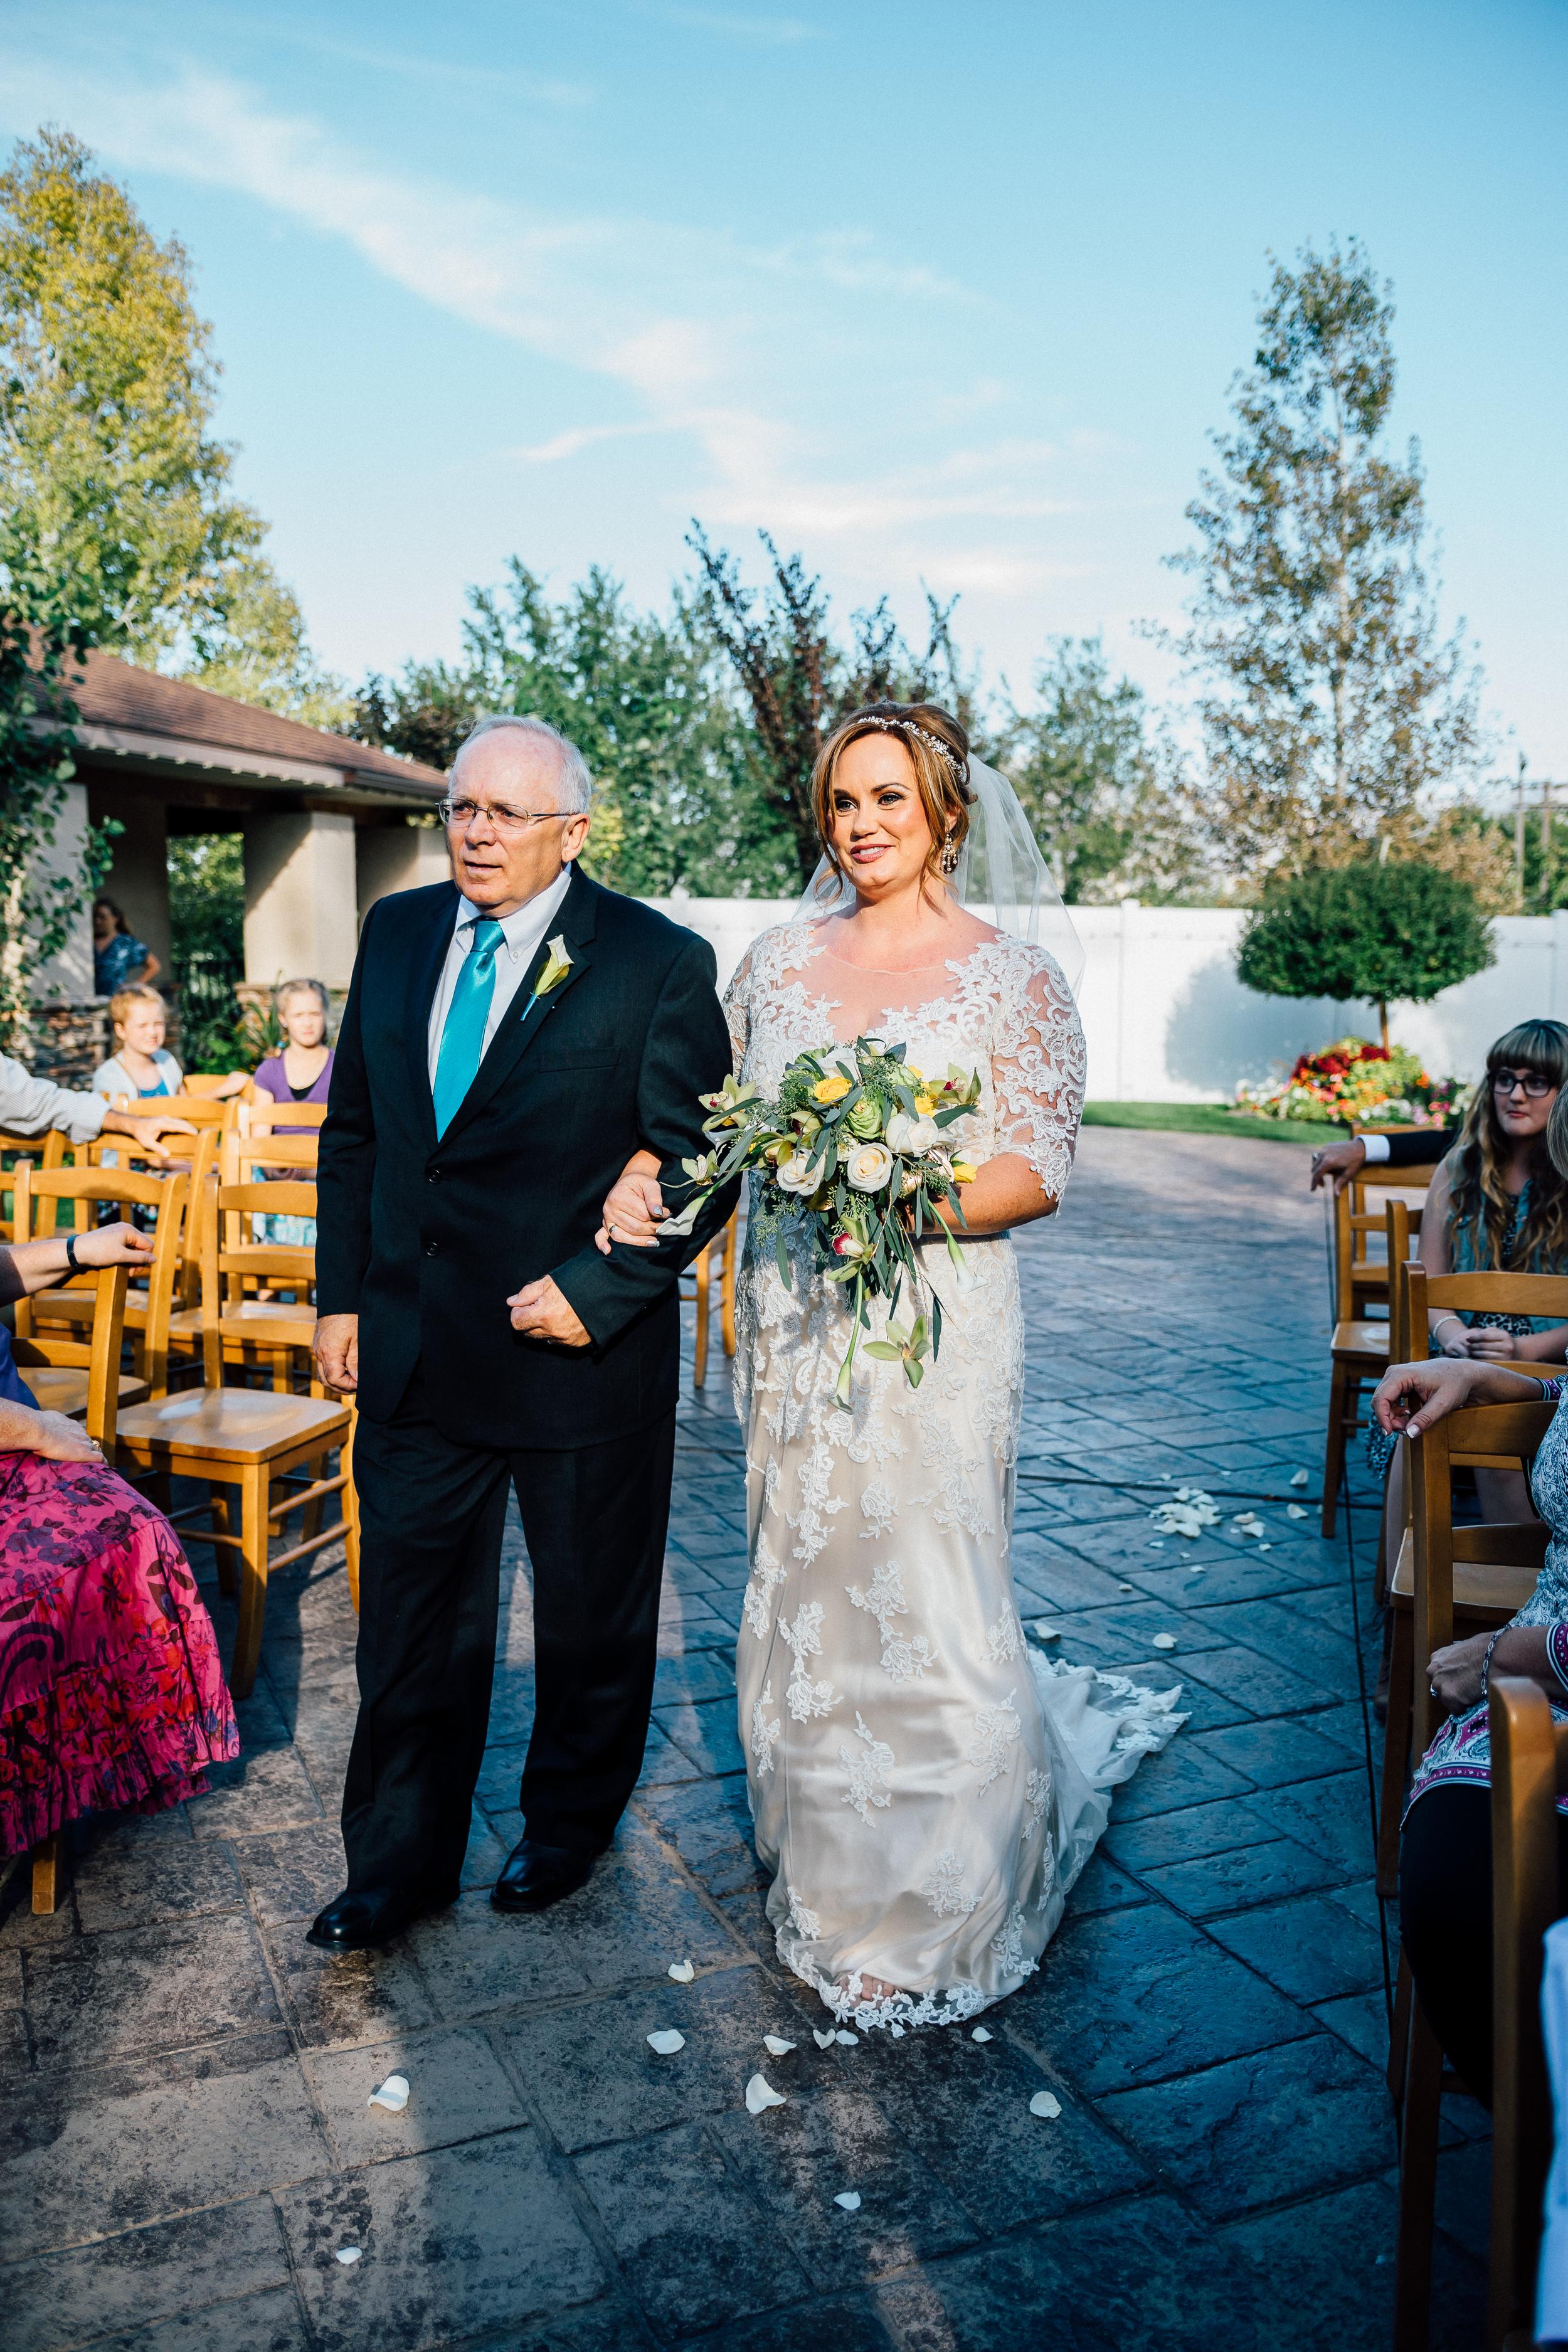 Coskun+Wedding9.jpg